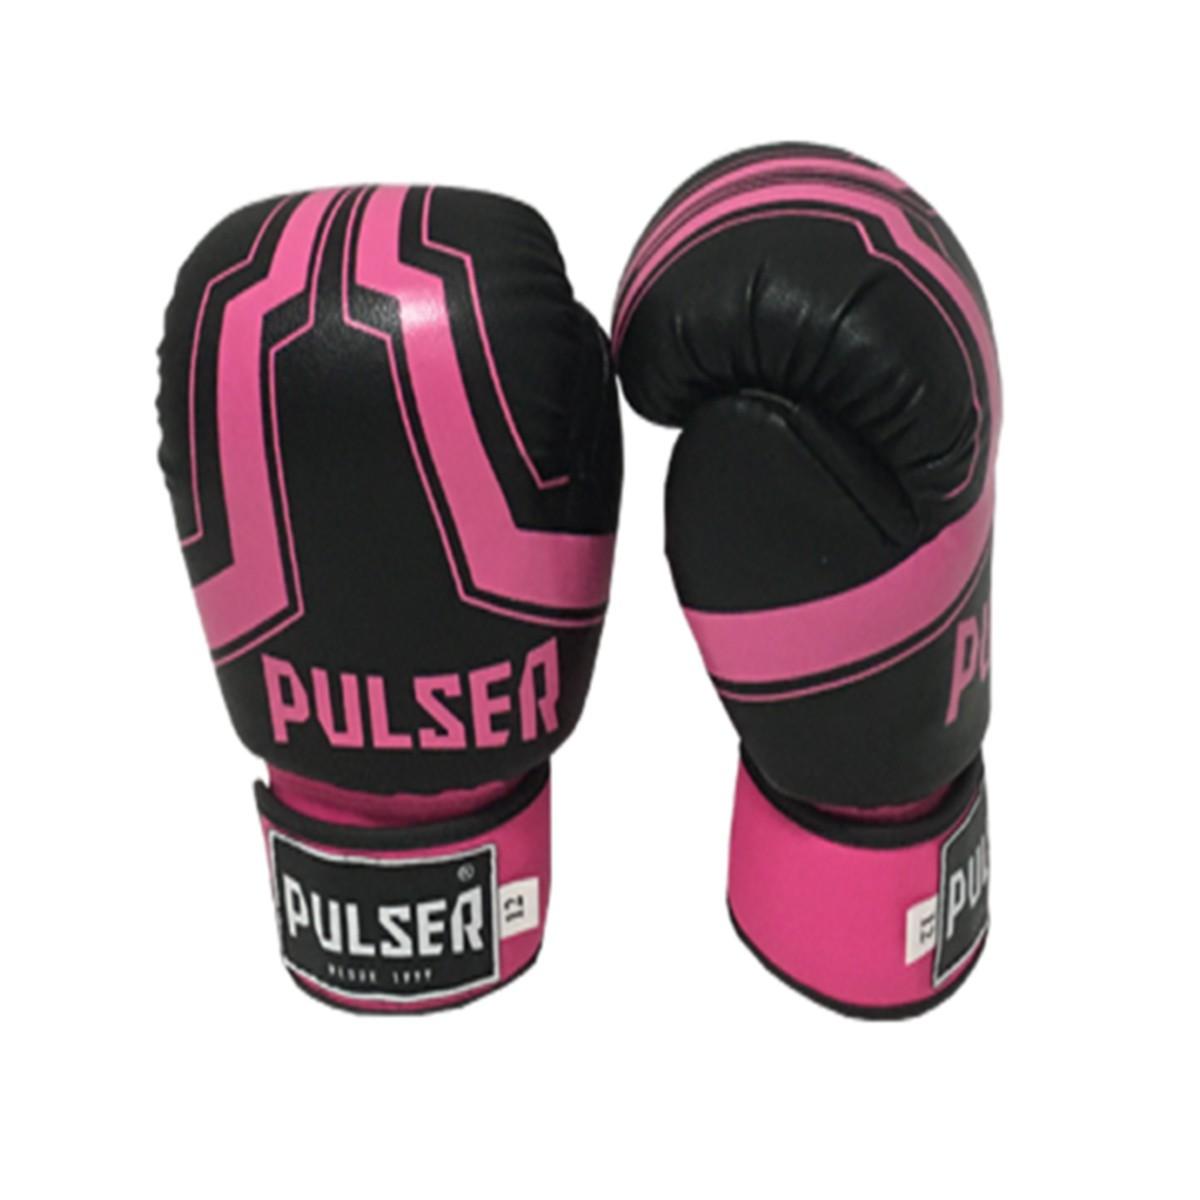 Kit de Boxe / Muay Thai Feminino 12oz - Preto e Rosa Iron  - Pulser  - PRALUTA SHOP